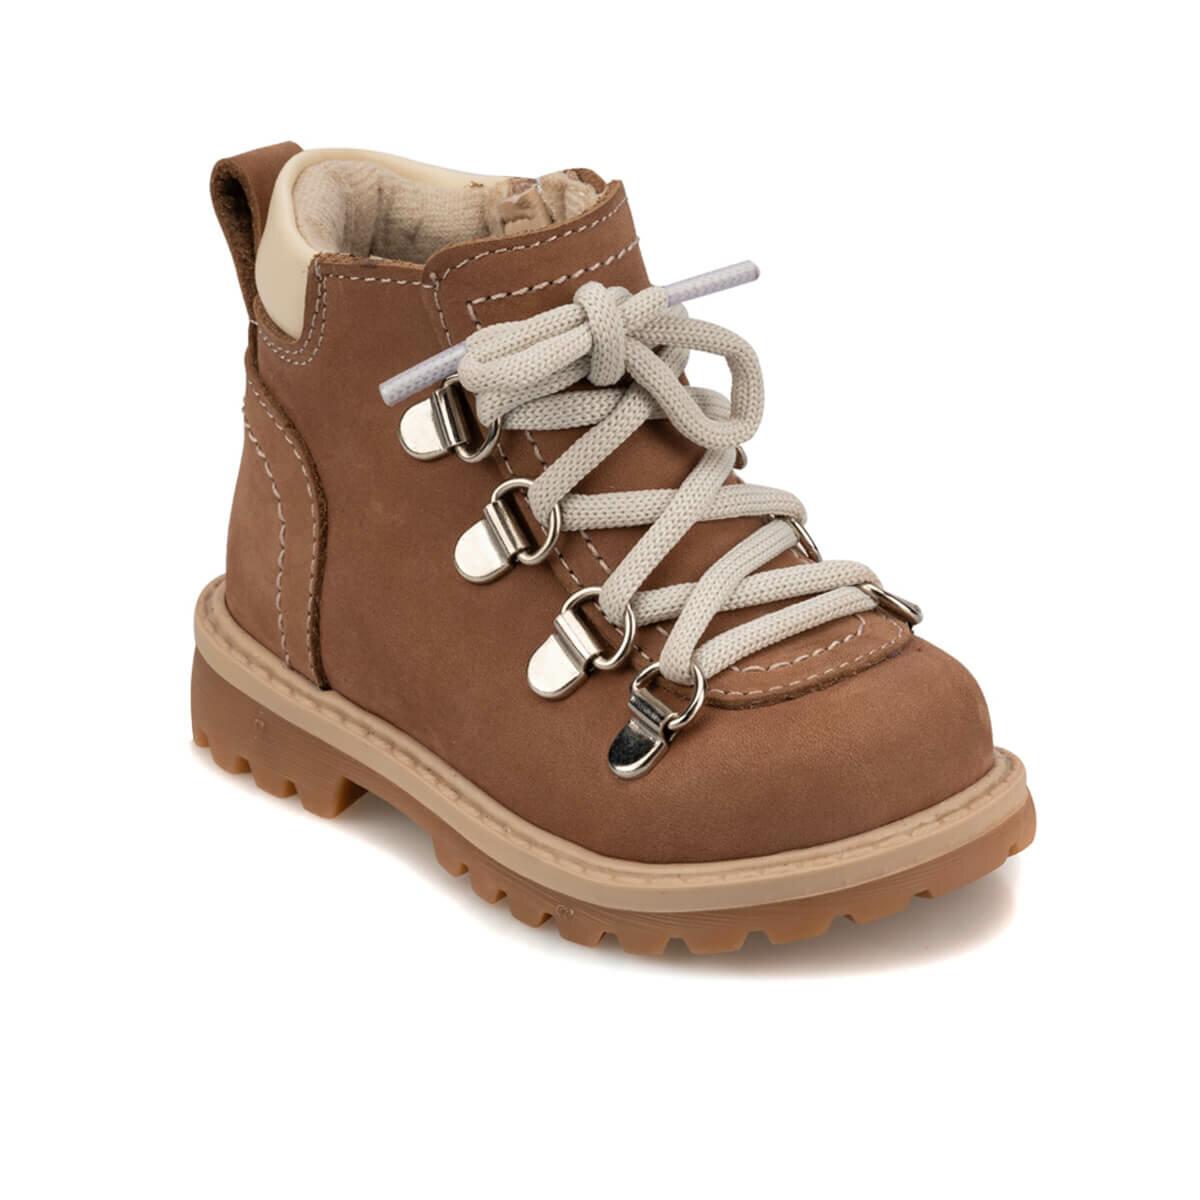 FLO 92.509544.I Sand Color Male Child Boots Polaris